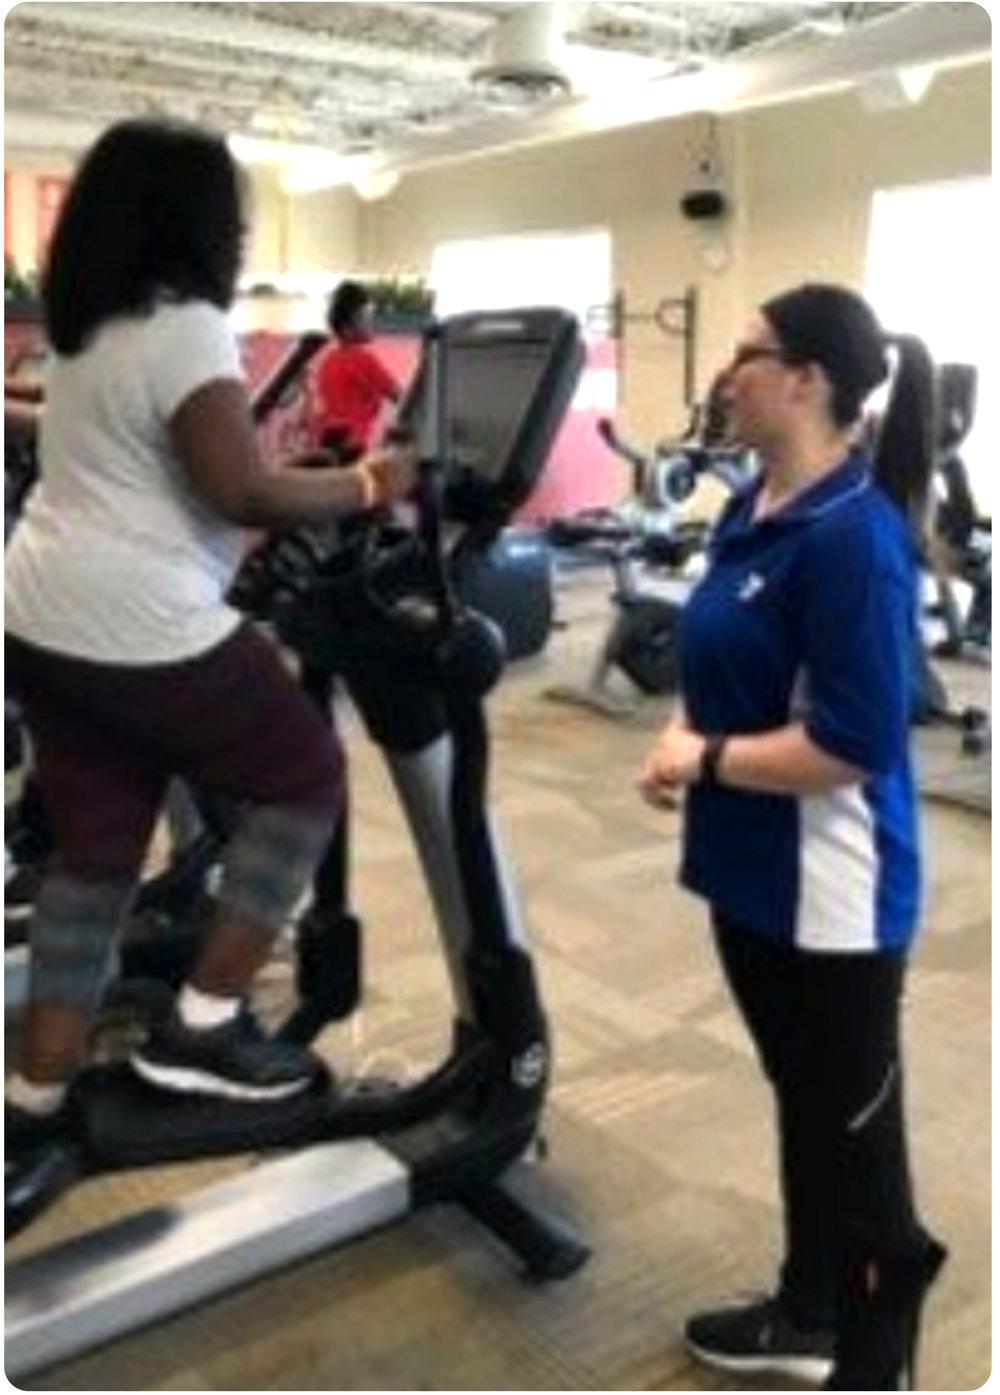 Sam as a YMCA Wellness Coach